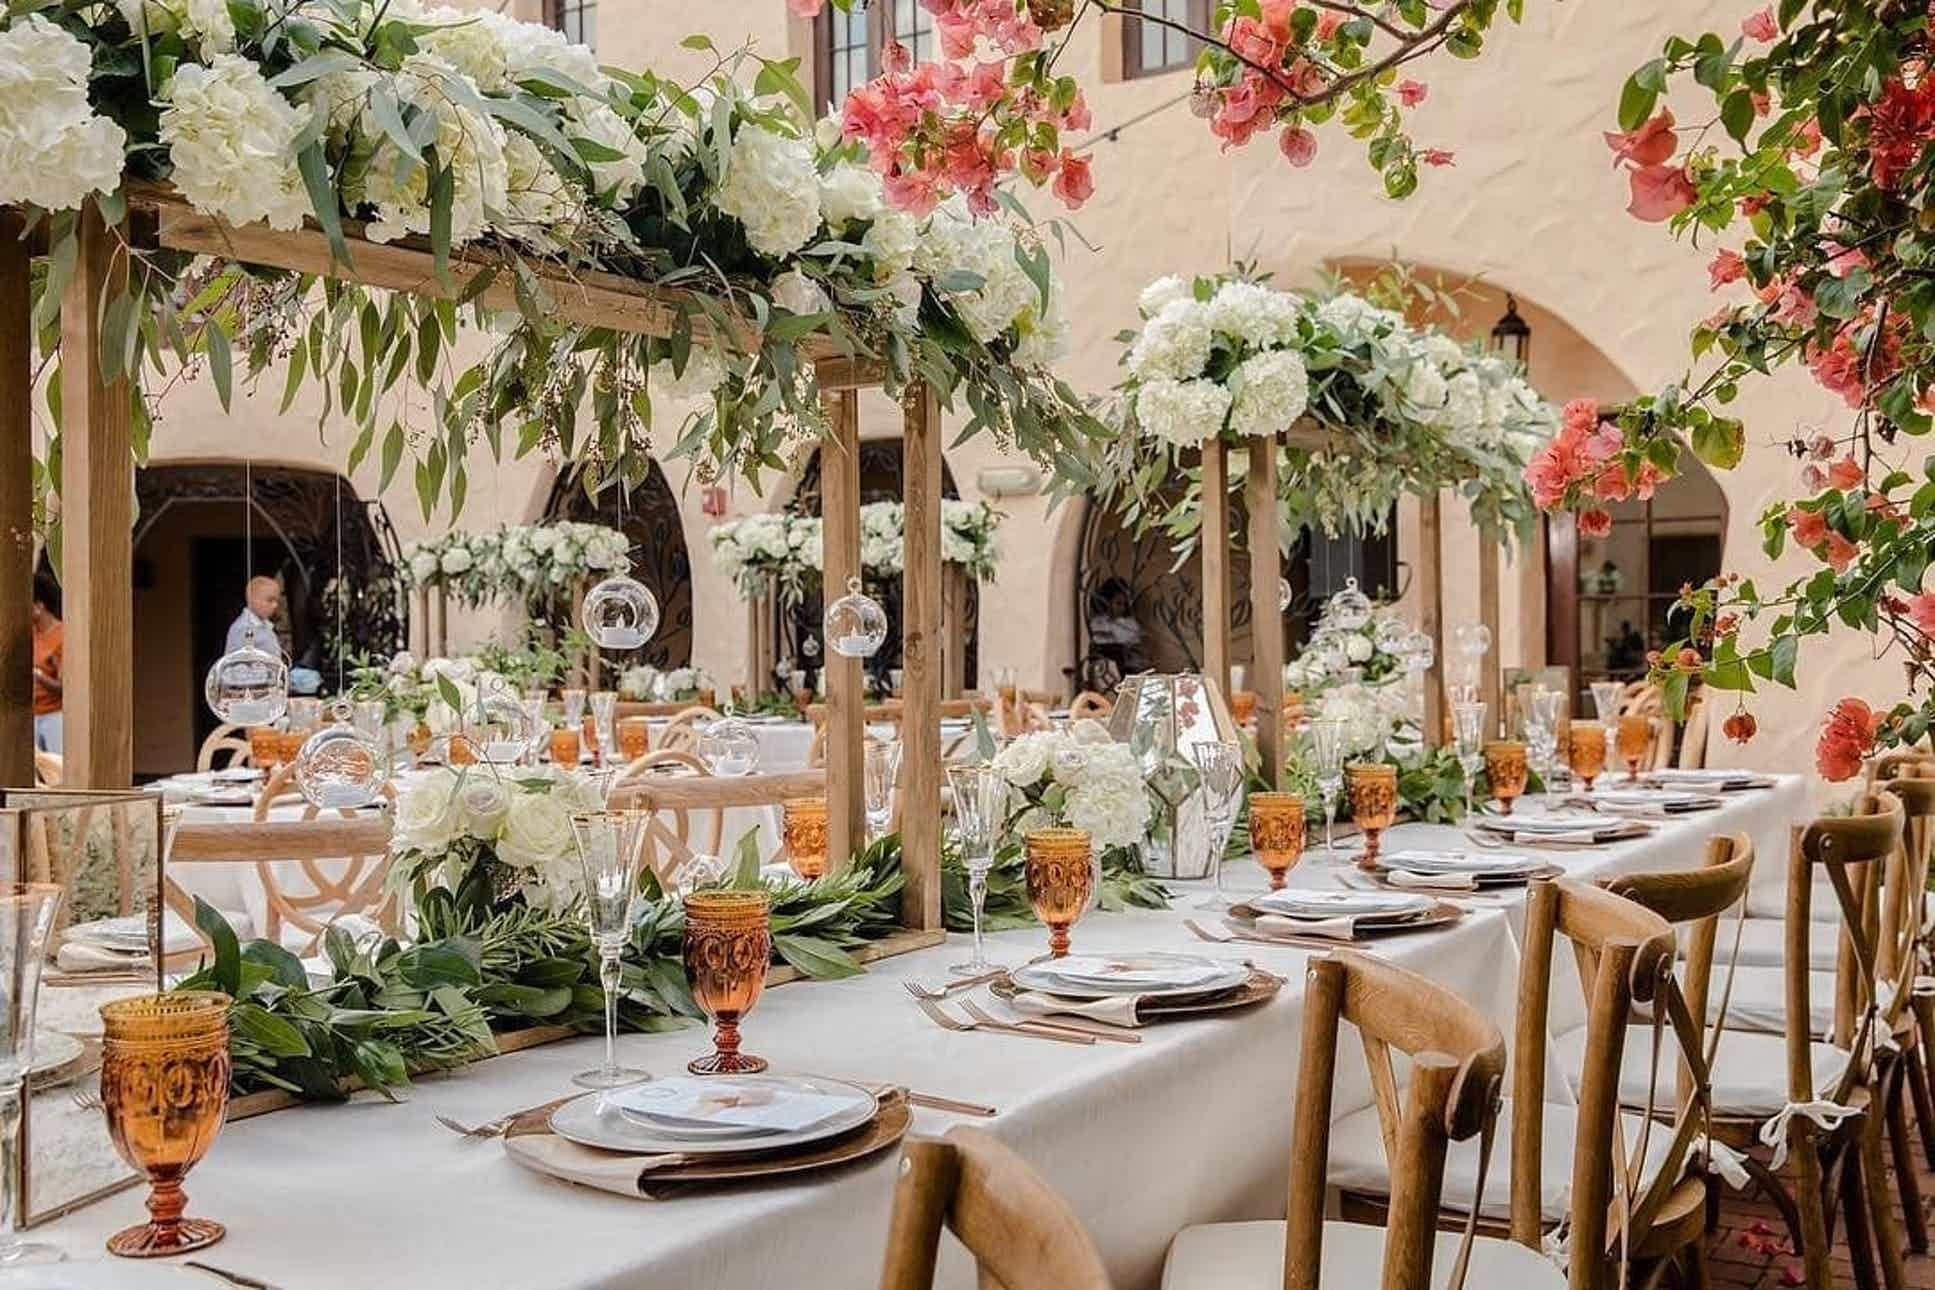 Pin By Keissy Yzaguirre On Wedding Ideas In 2020 Fort Lauderdale Wedding Florida Wedding Venues Mansion Wedding Venues